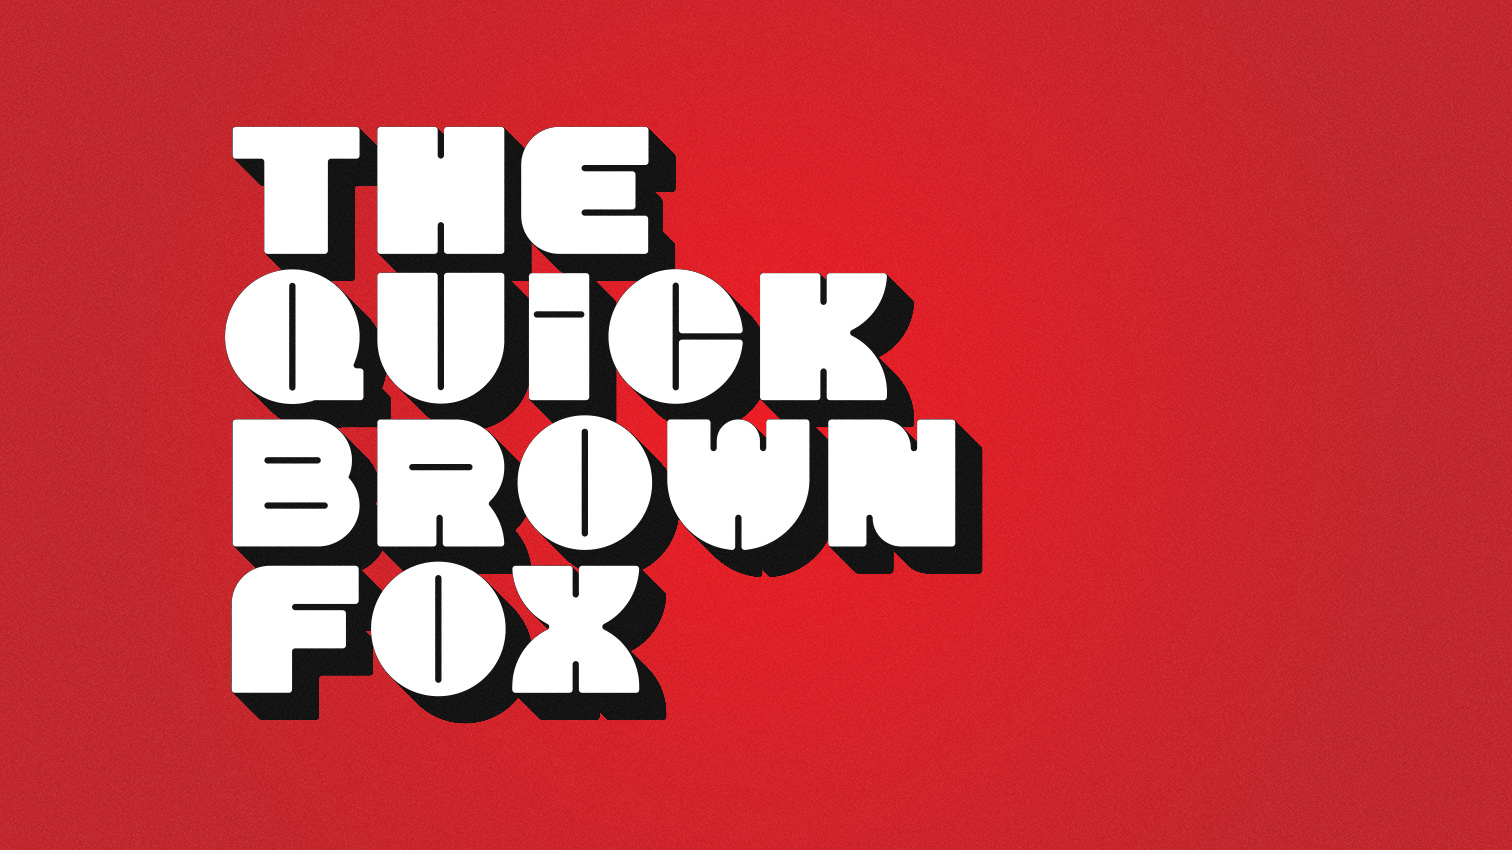 Chonky font